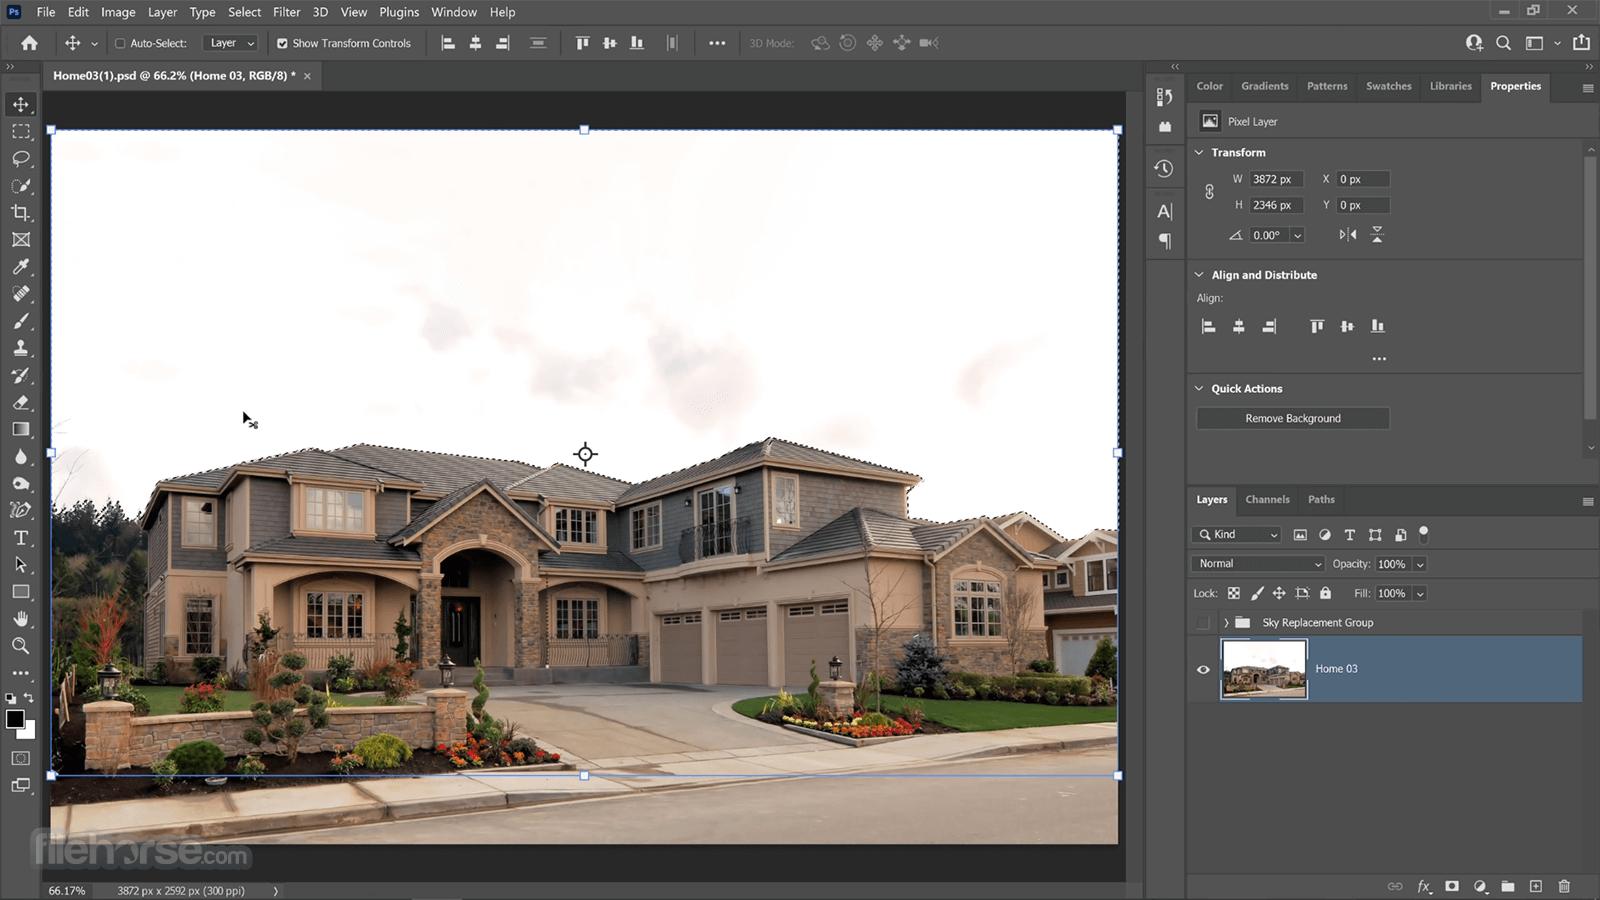 Adobe Photoshop CC 2021 22.3 (64-bit) Screenshot 1